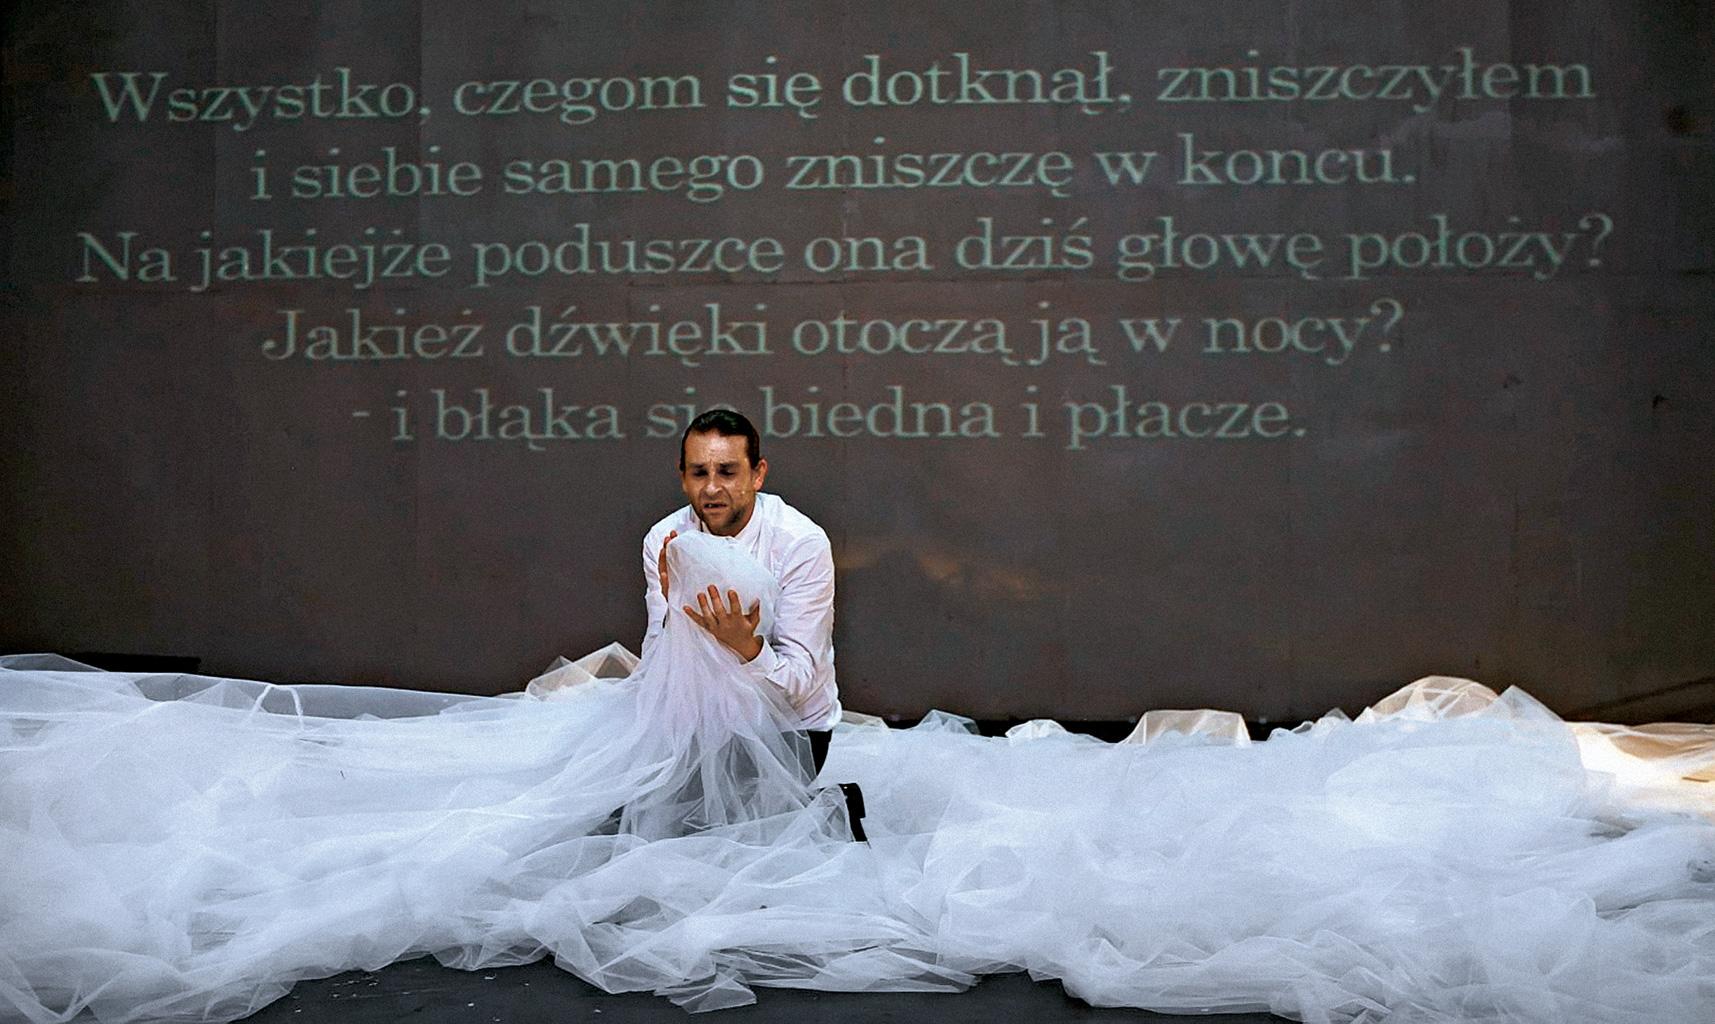 ksigarnia internetowa, ksiki - Chodnik Literacki